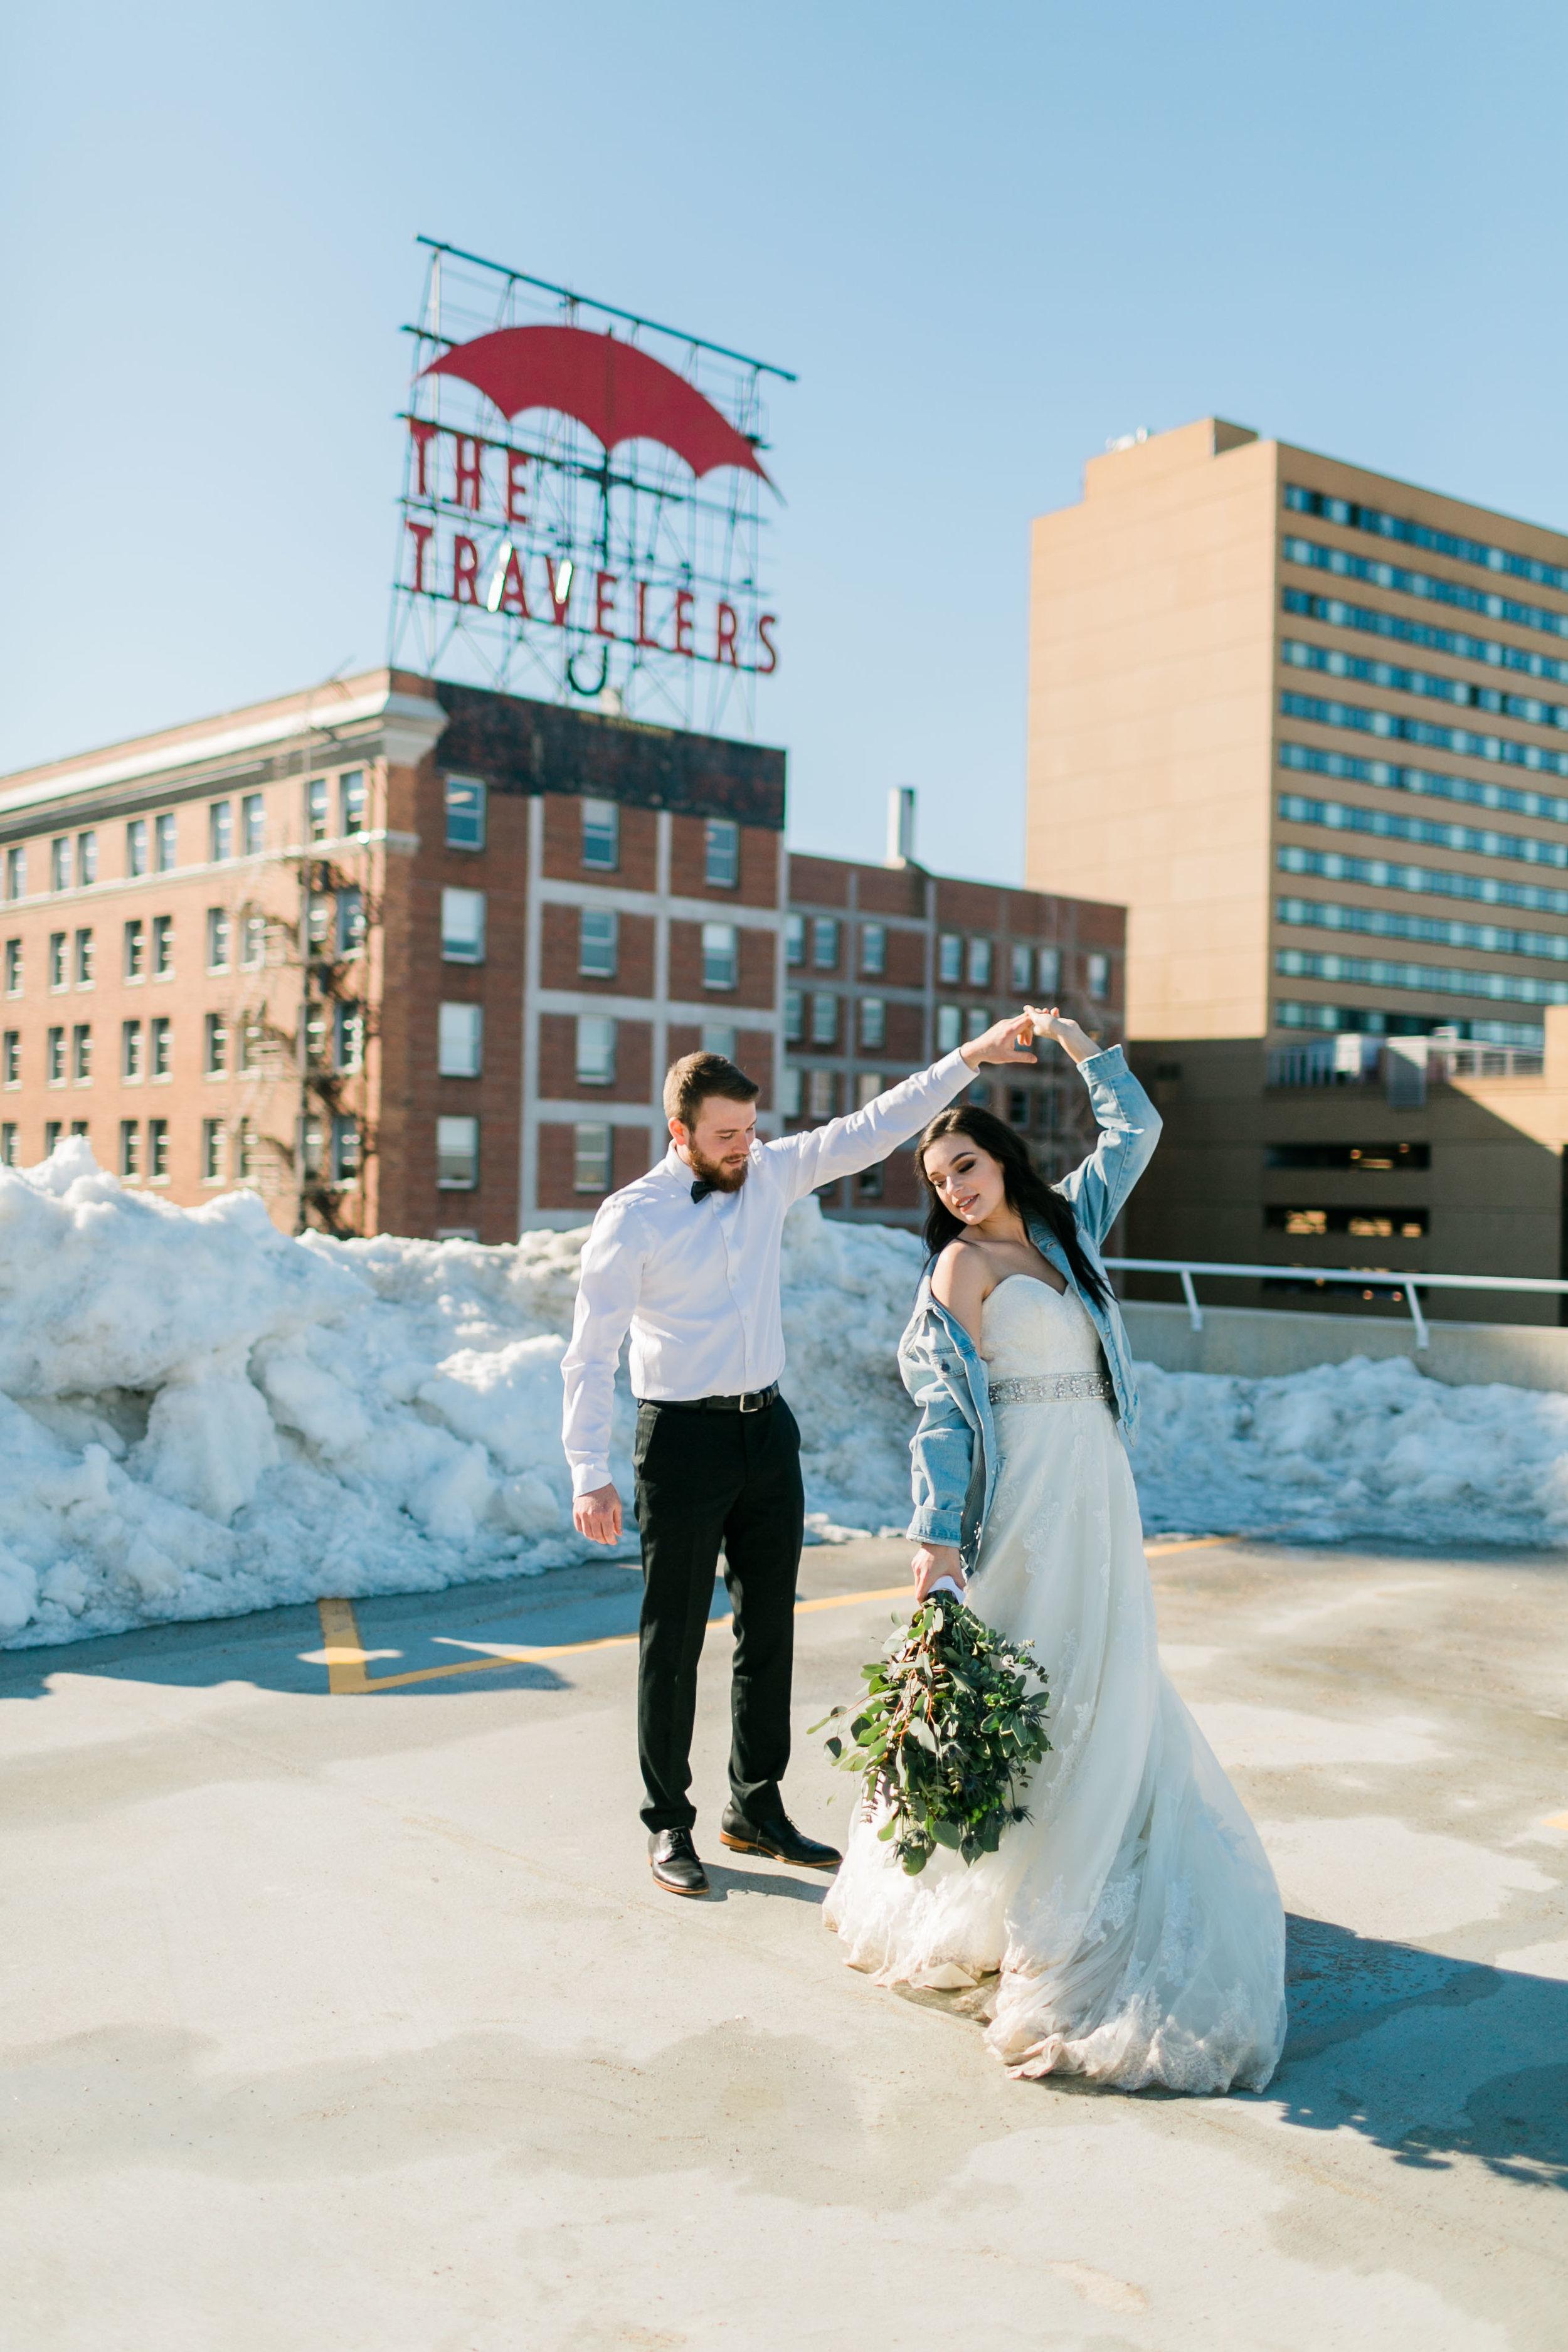 IMG_4157.jpgDes Moines Iowa Wedding Photographer